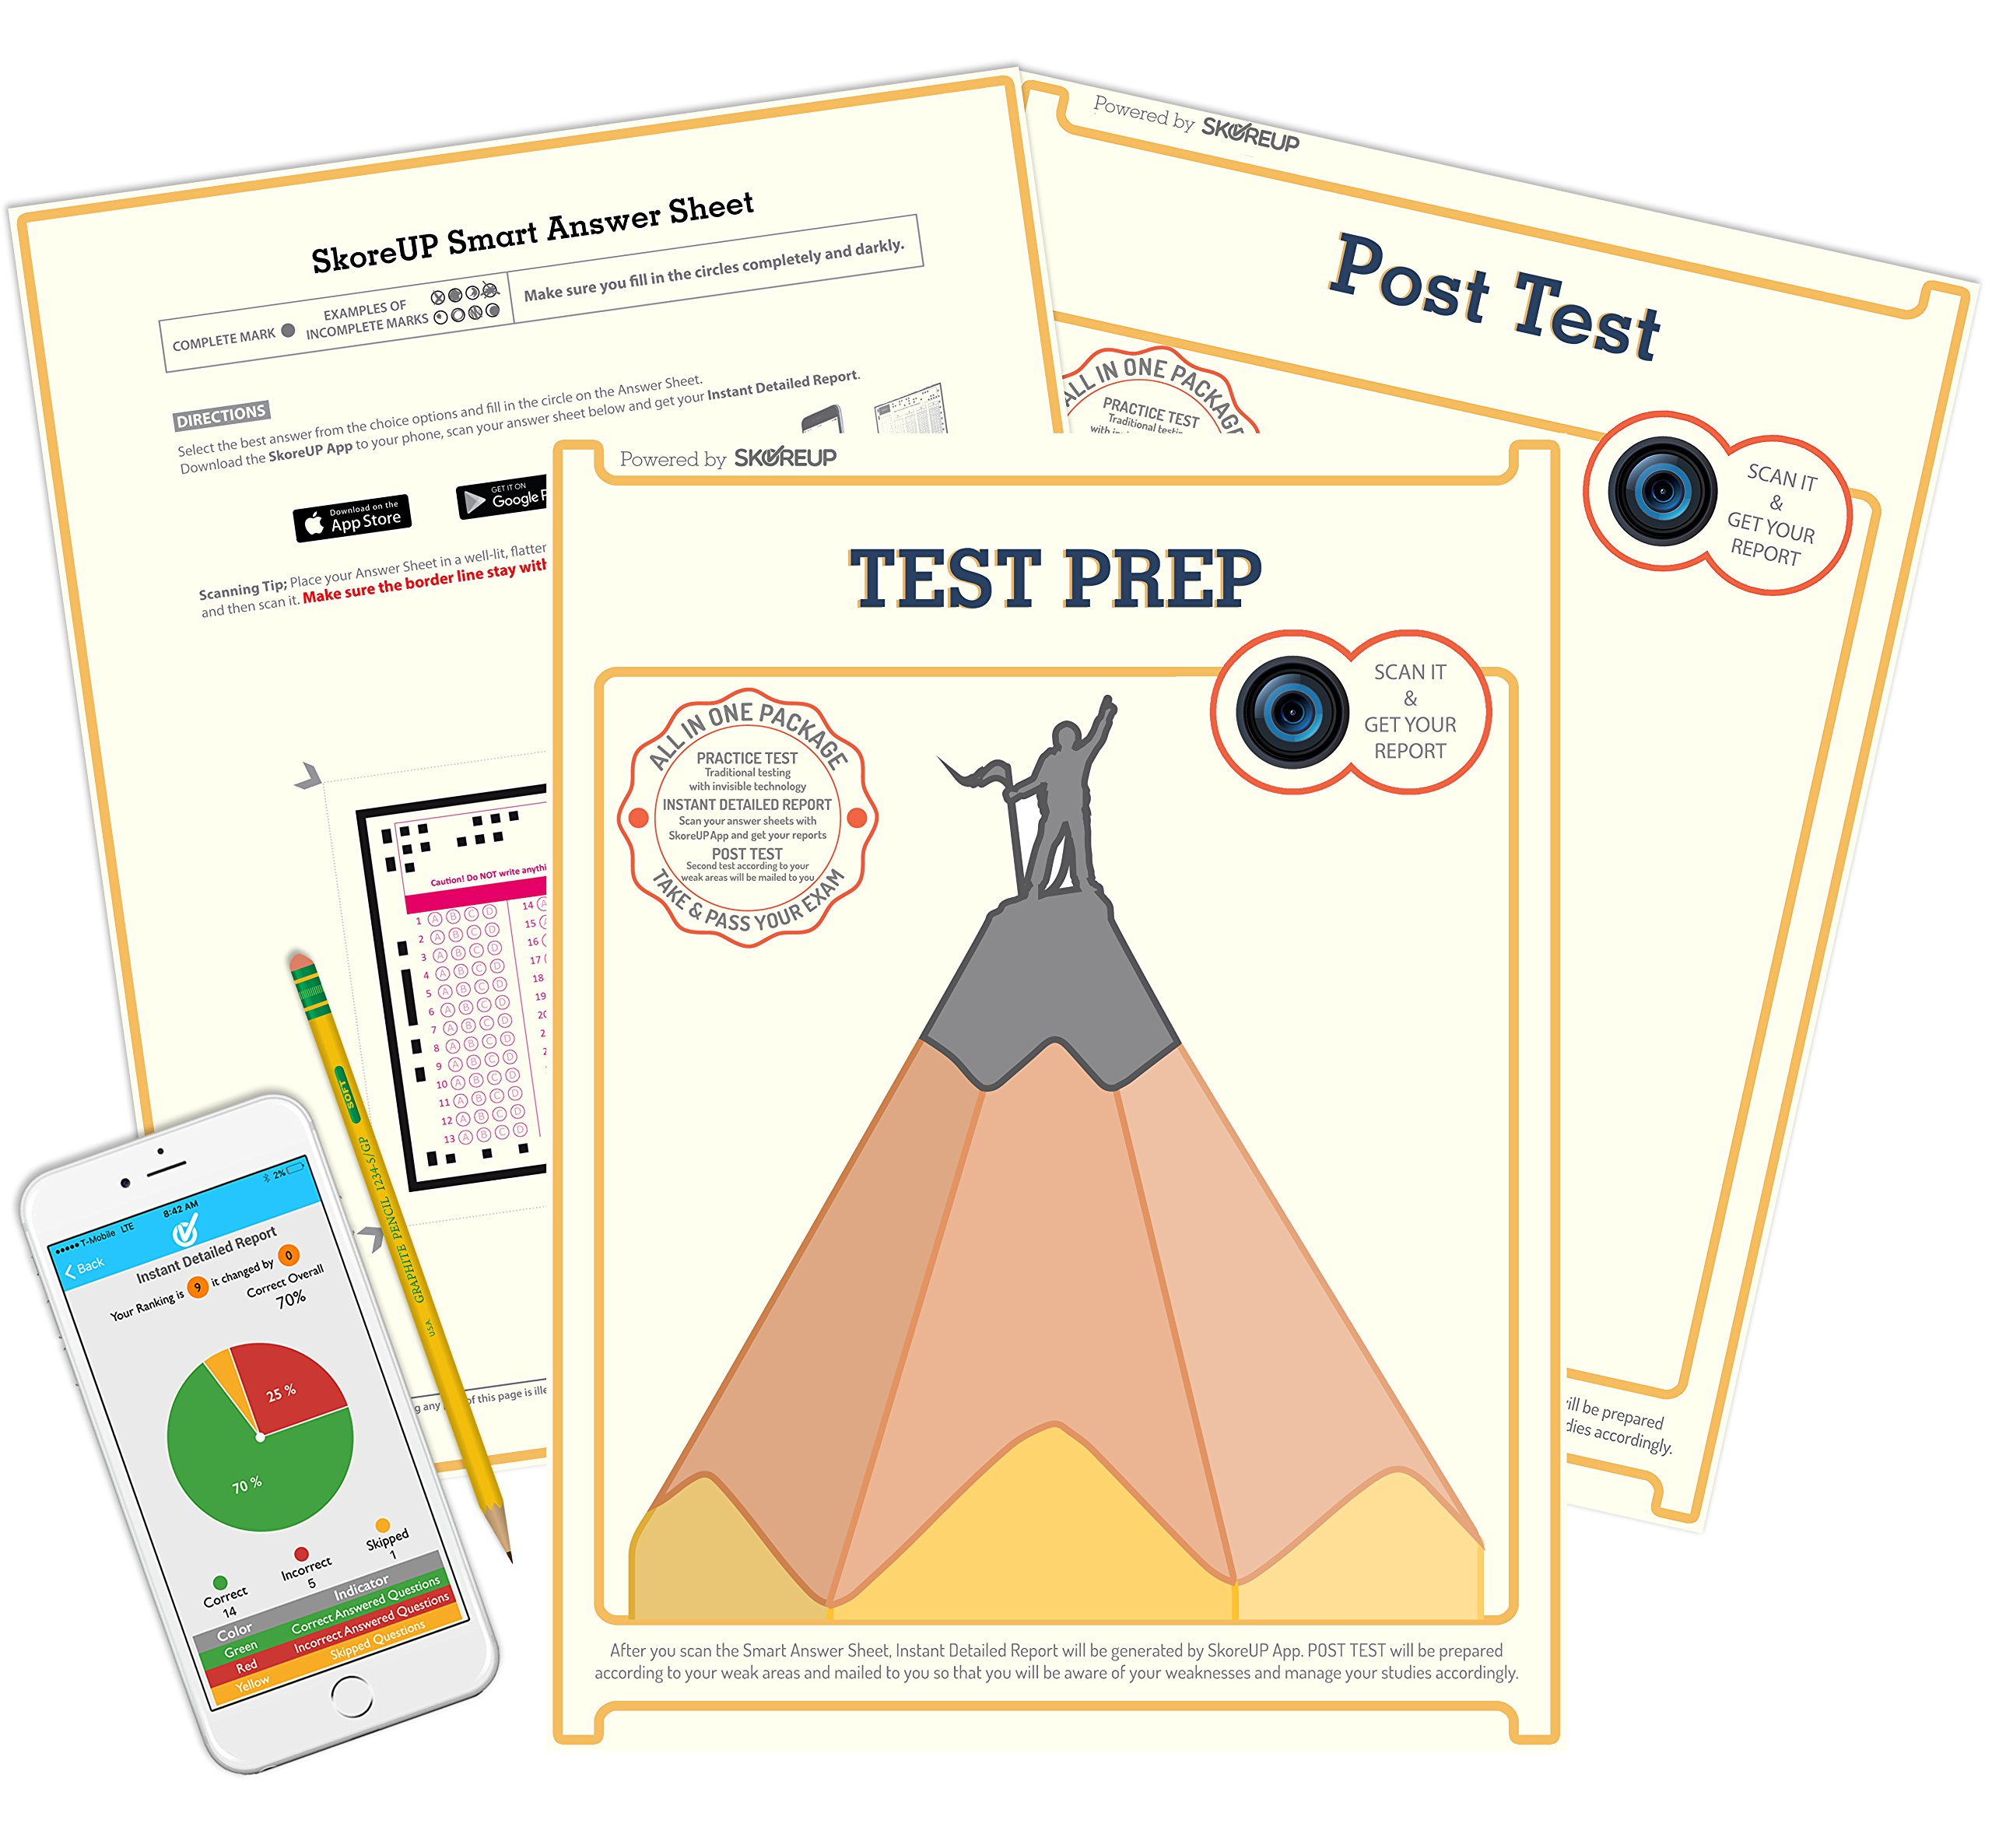 School Custodian-Engineer Exam, Career Test Prep, Study